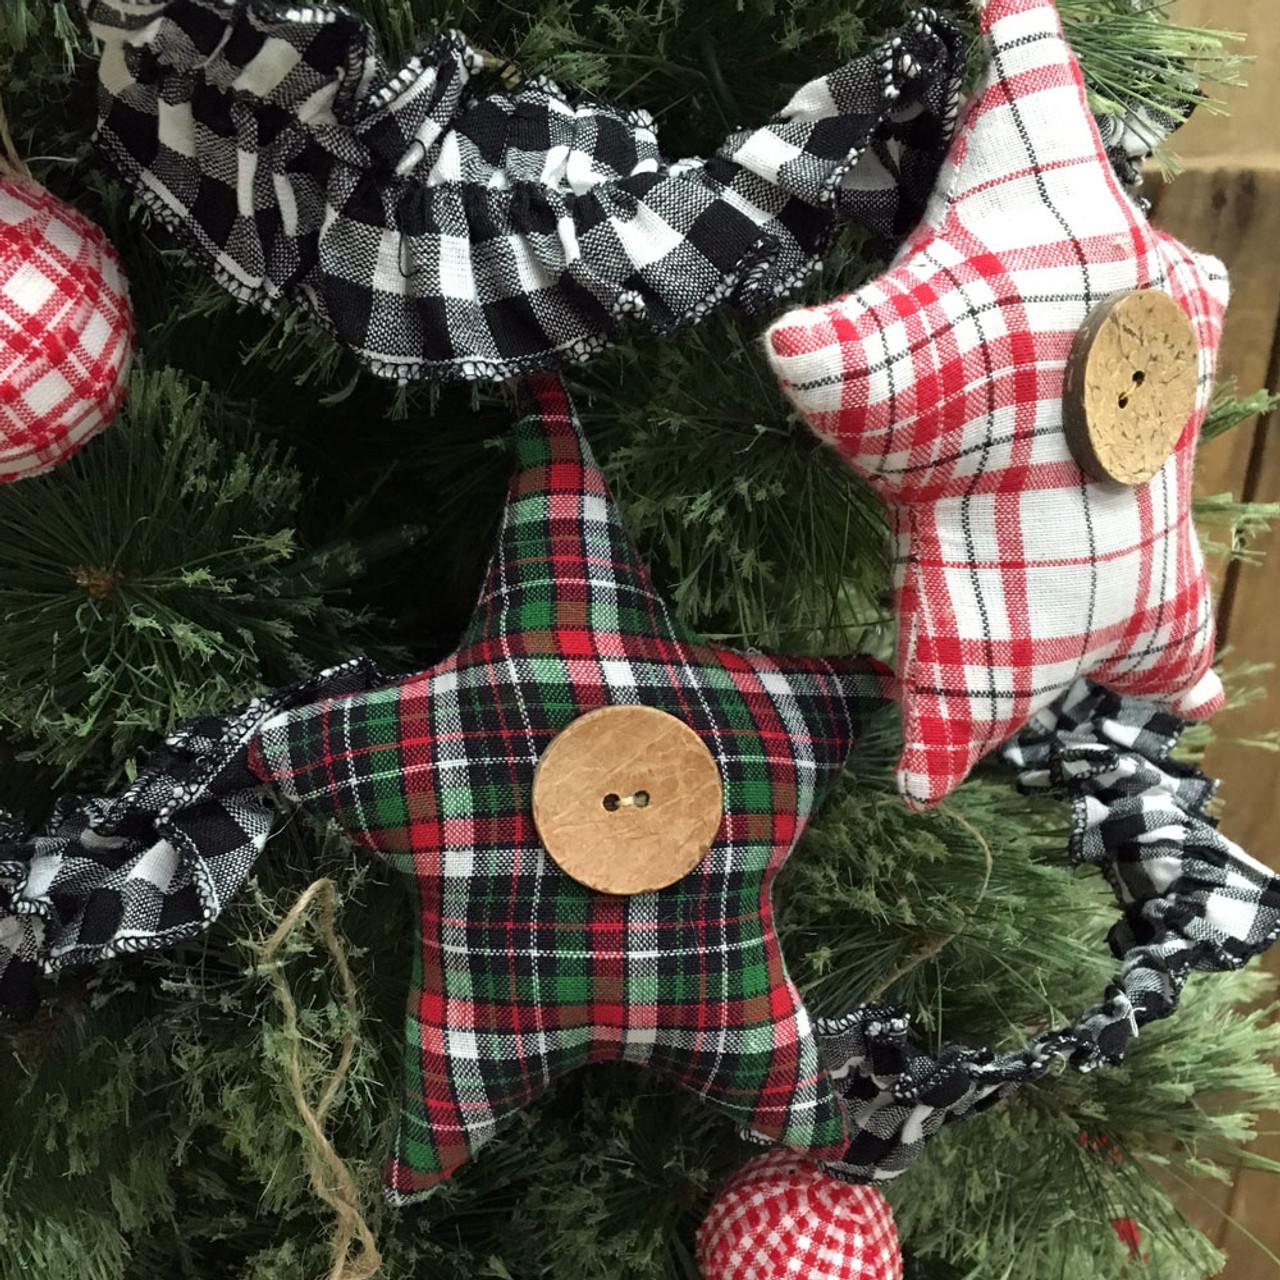 Tartan Plaid Homespun Fabric Star Christmas Ornaments - Set of 3